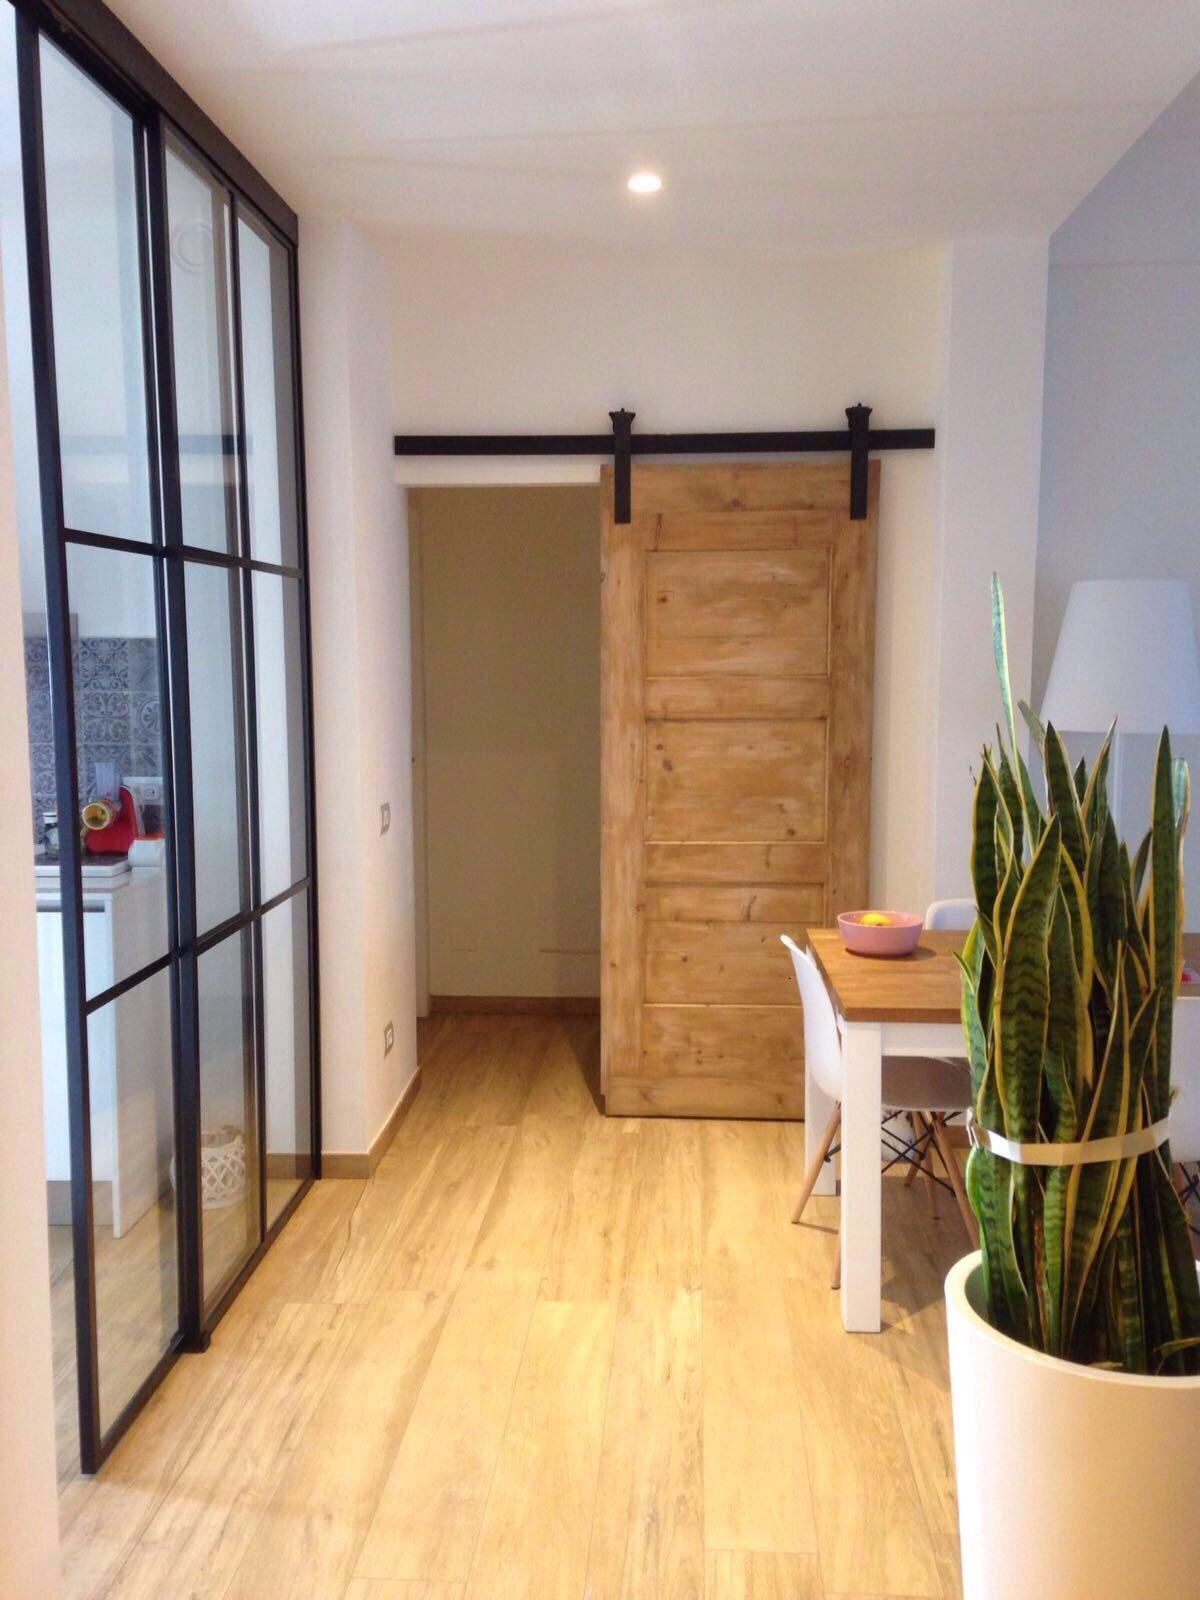 Porte Scorrevoli Stile Industriale appartamento industrial - barn door - picture gallery